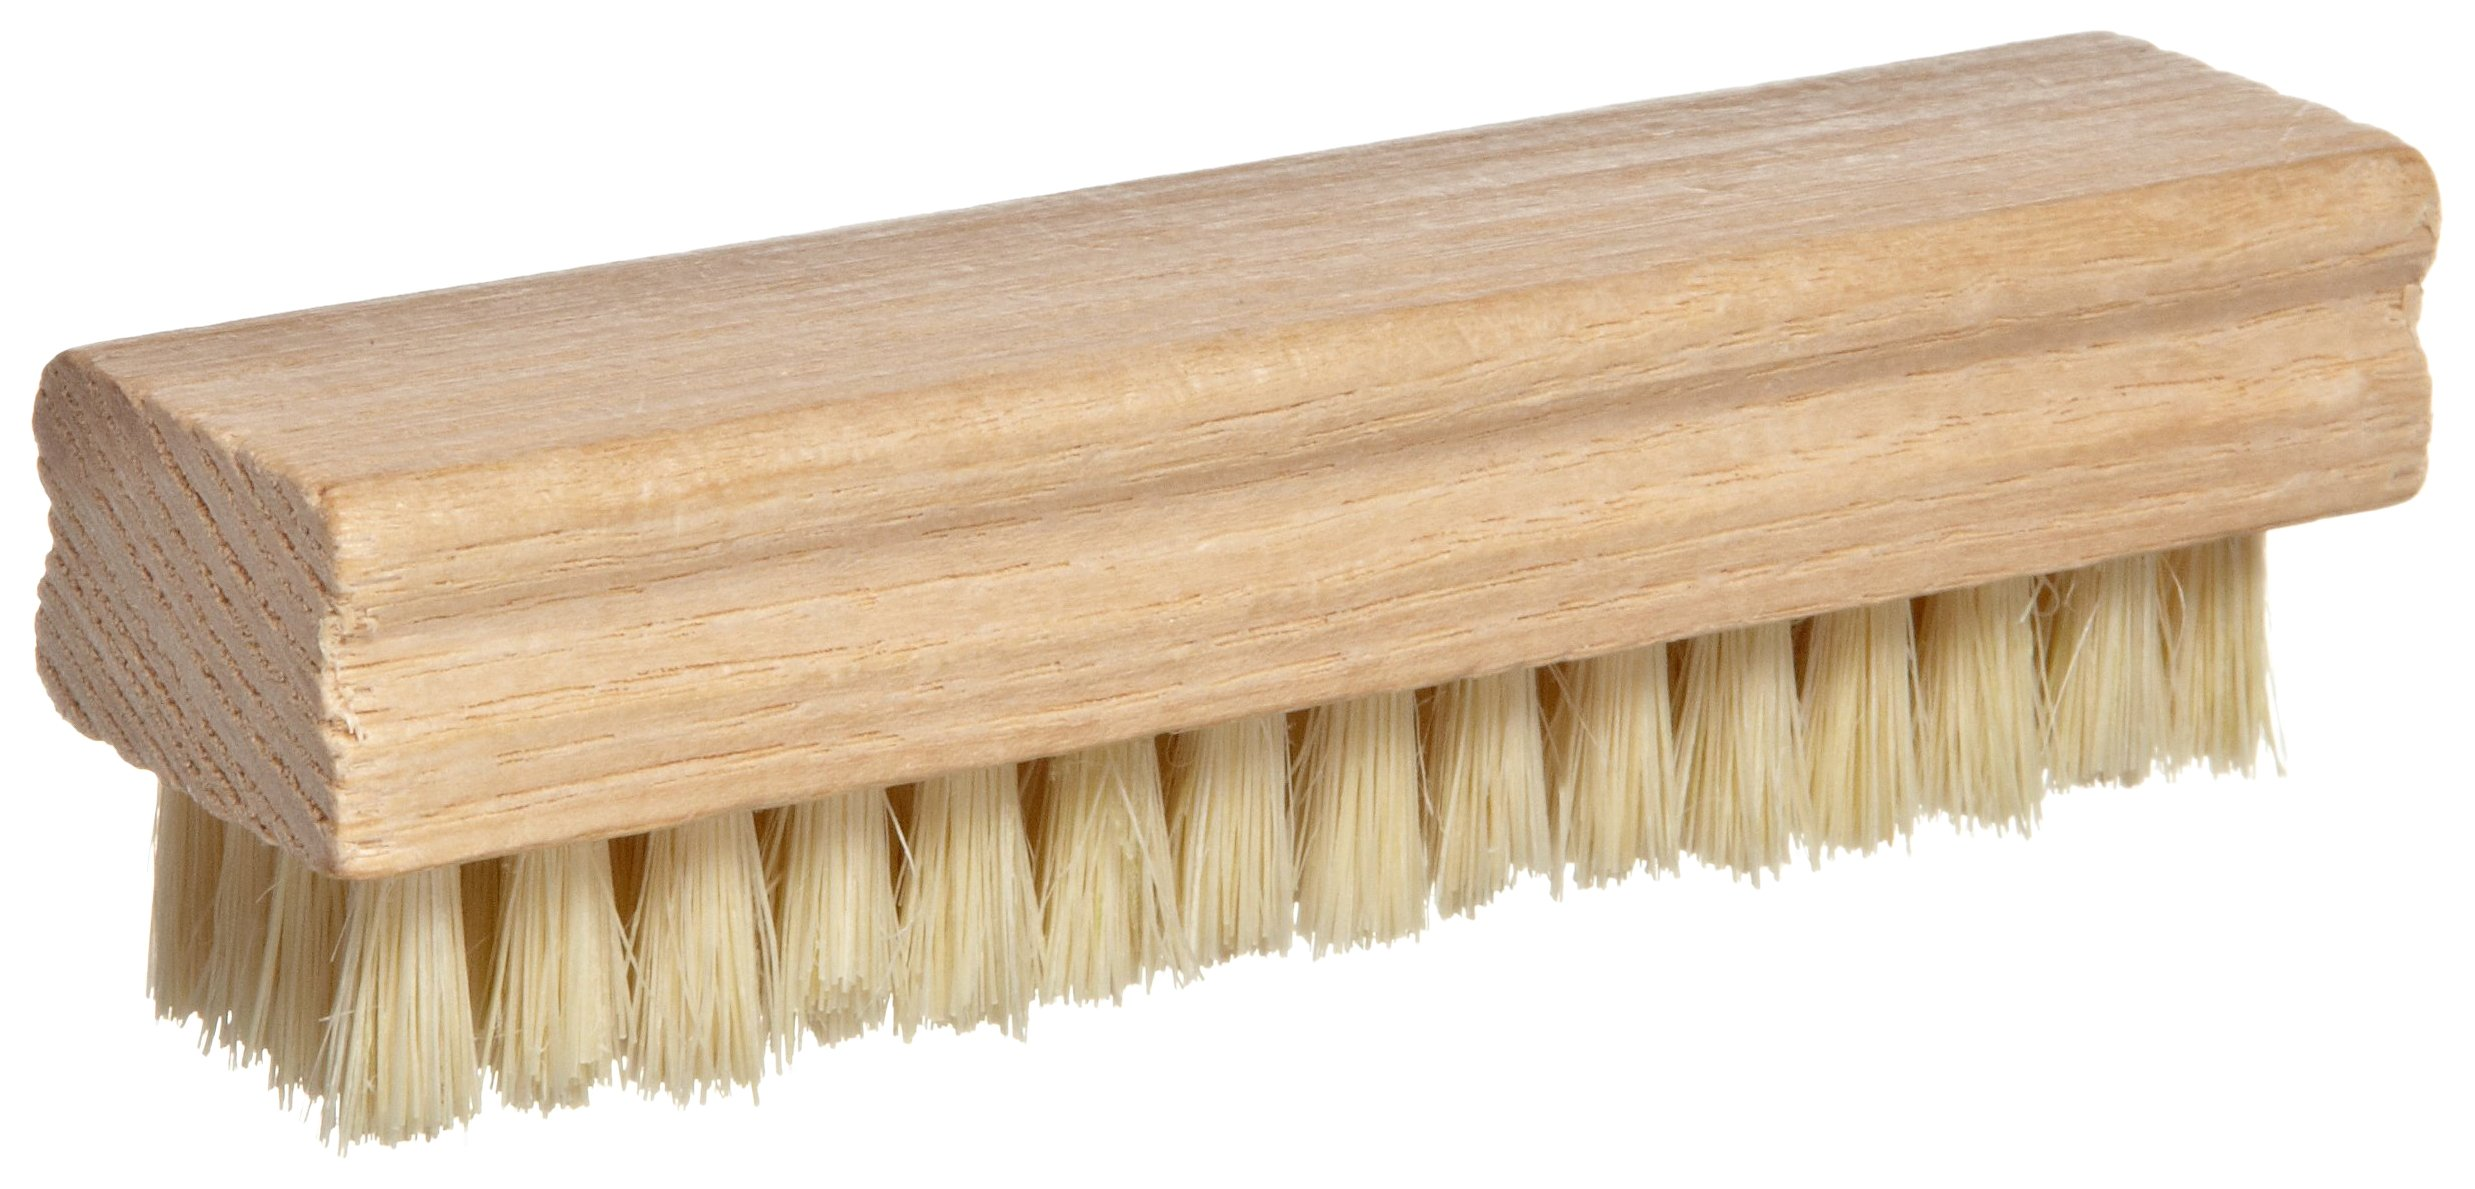 Magnolia Brush 176 Hand and Nail Brush, Tampico Bristles, 5/8'' Trim, 4-3/4'' Length x 1-1/4'' Width, White (Case of 36)